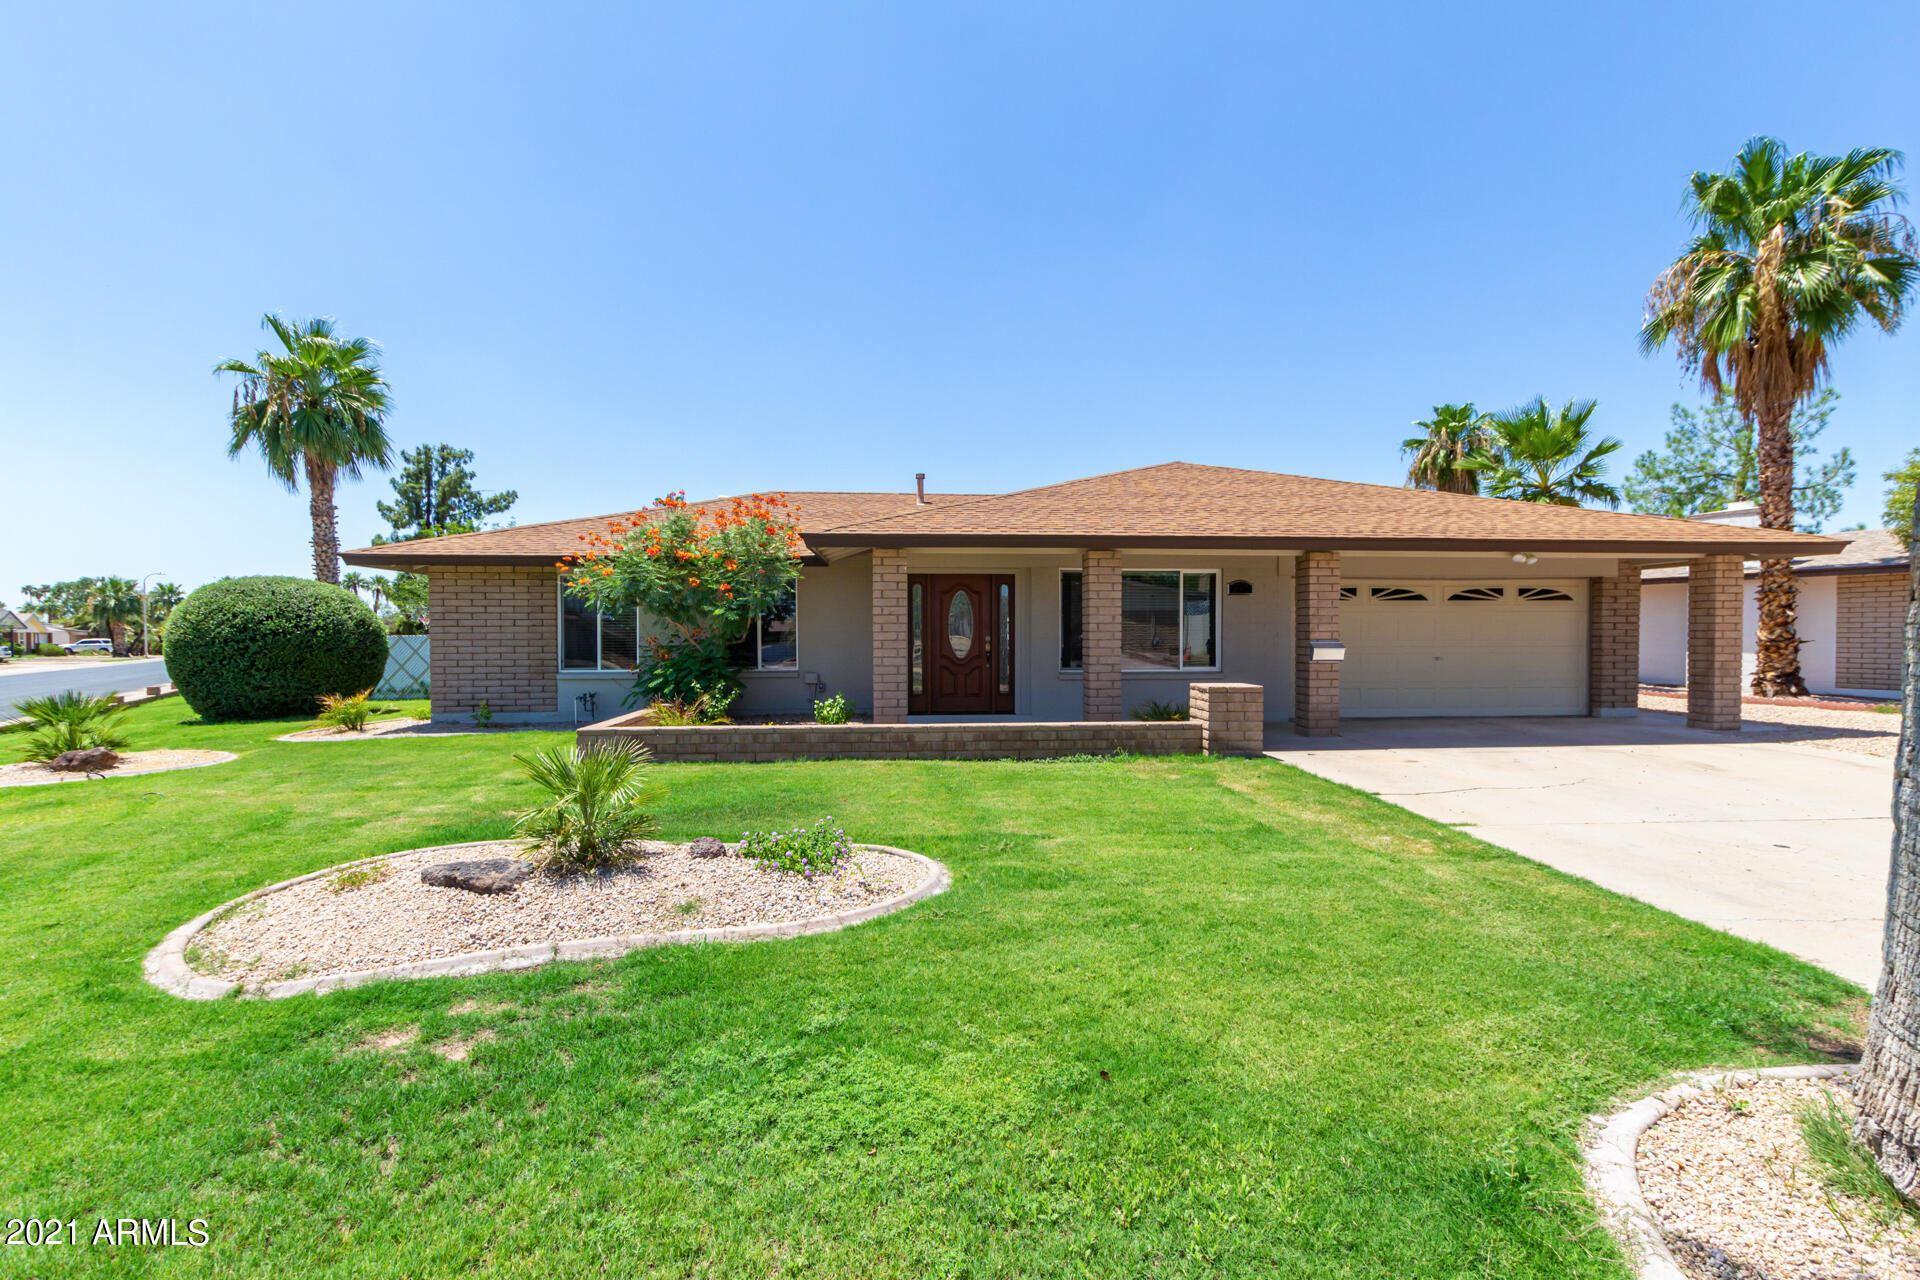 Photo of 9226 N 40TH Drive, Phoenix, AZ 85051 (MLS # 6268913)